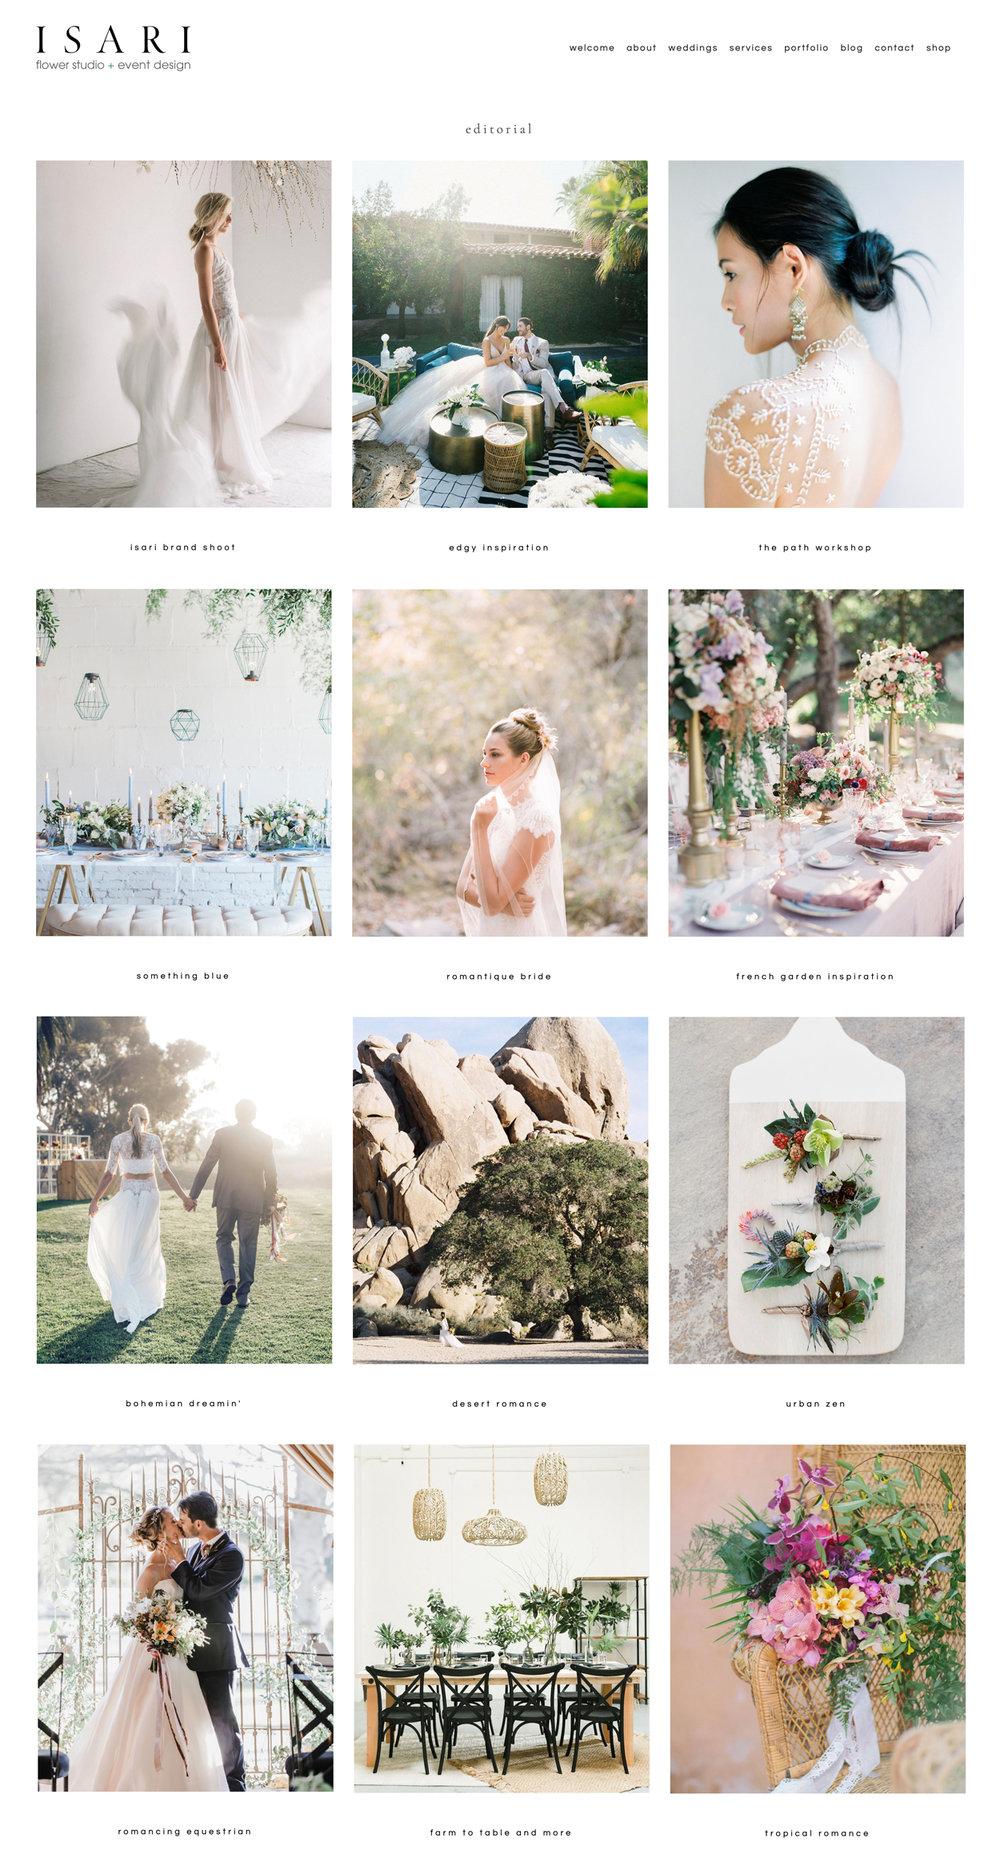 Isari Flower Studio Website   The Editor's Touch Squarespace Website Designer   Wedding Industry Expert